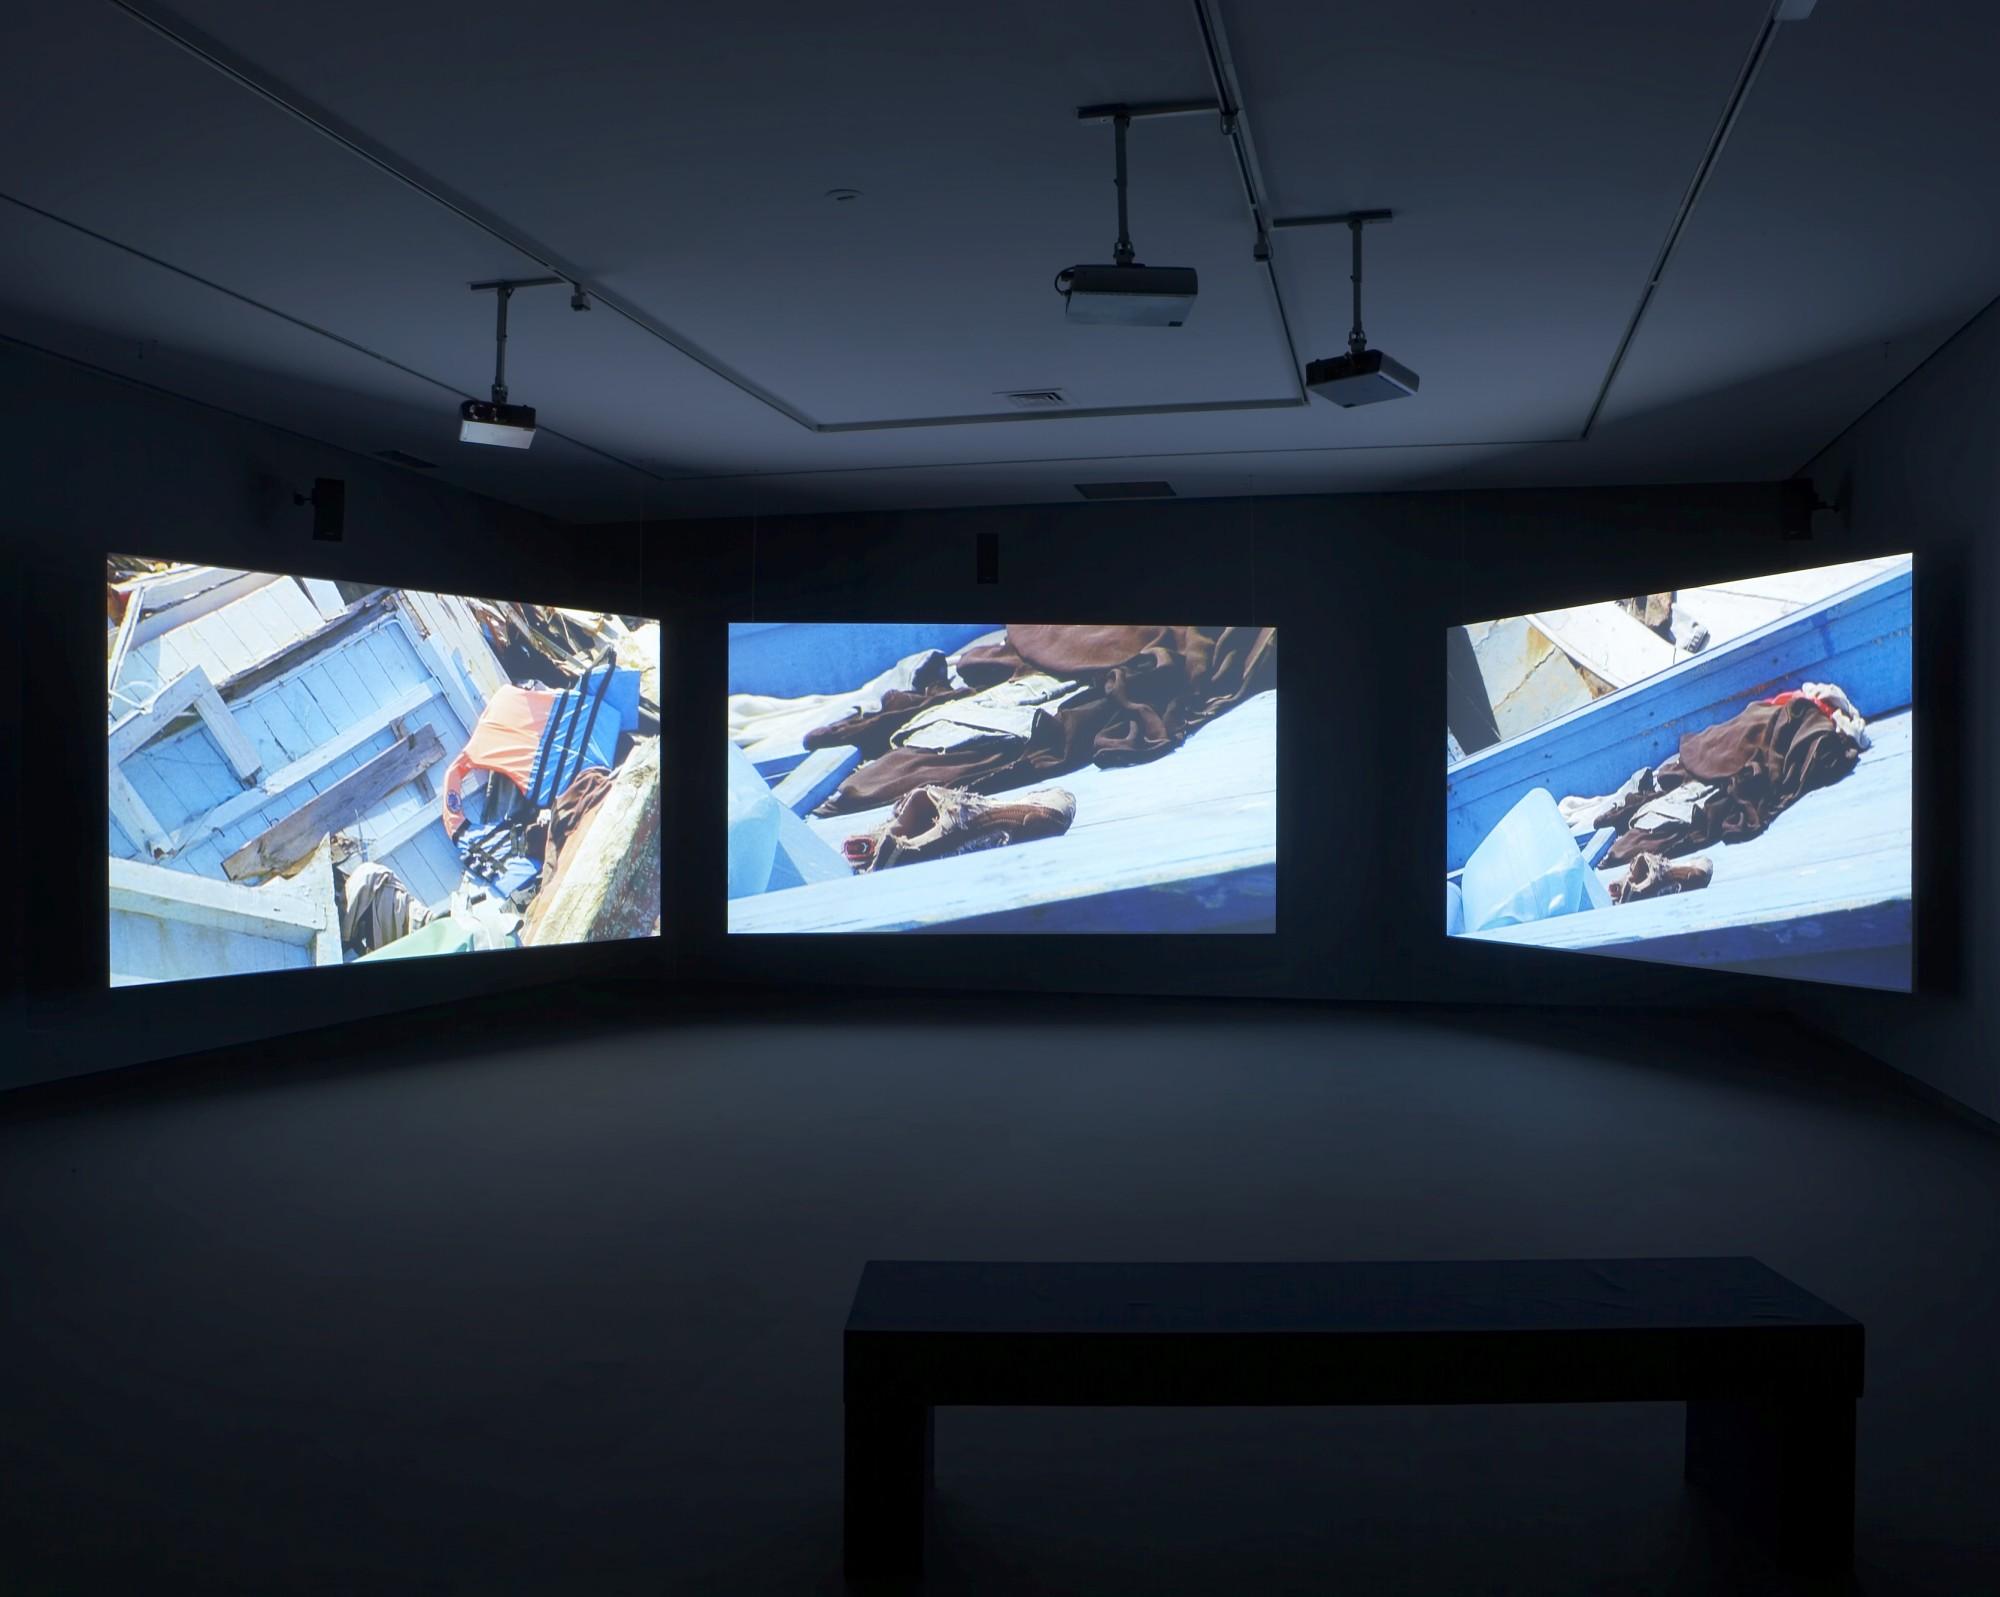 Isaac Julien: Western Union Small Boats. Galería Helga de Alvear, Madrid, 2008  18'22', three-screen film installation, 16mm film transferred to digital, colour, 5.1 sound